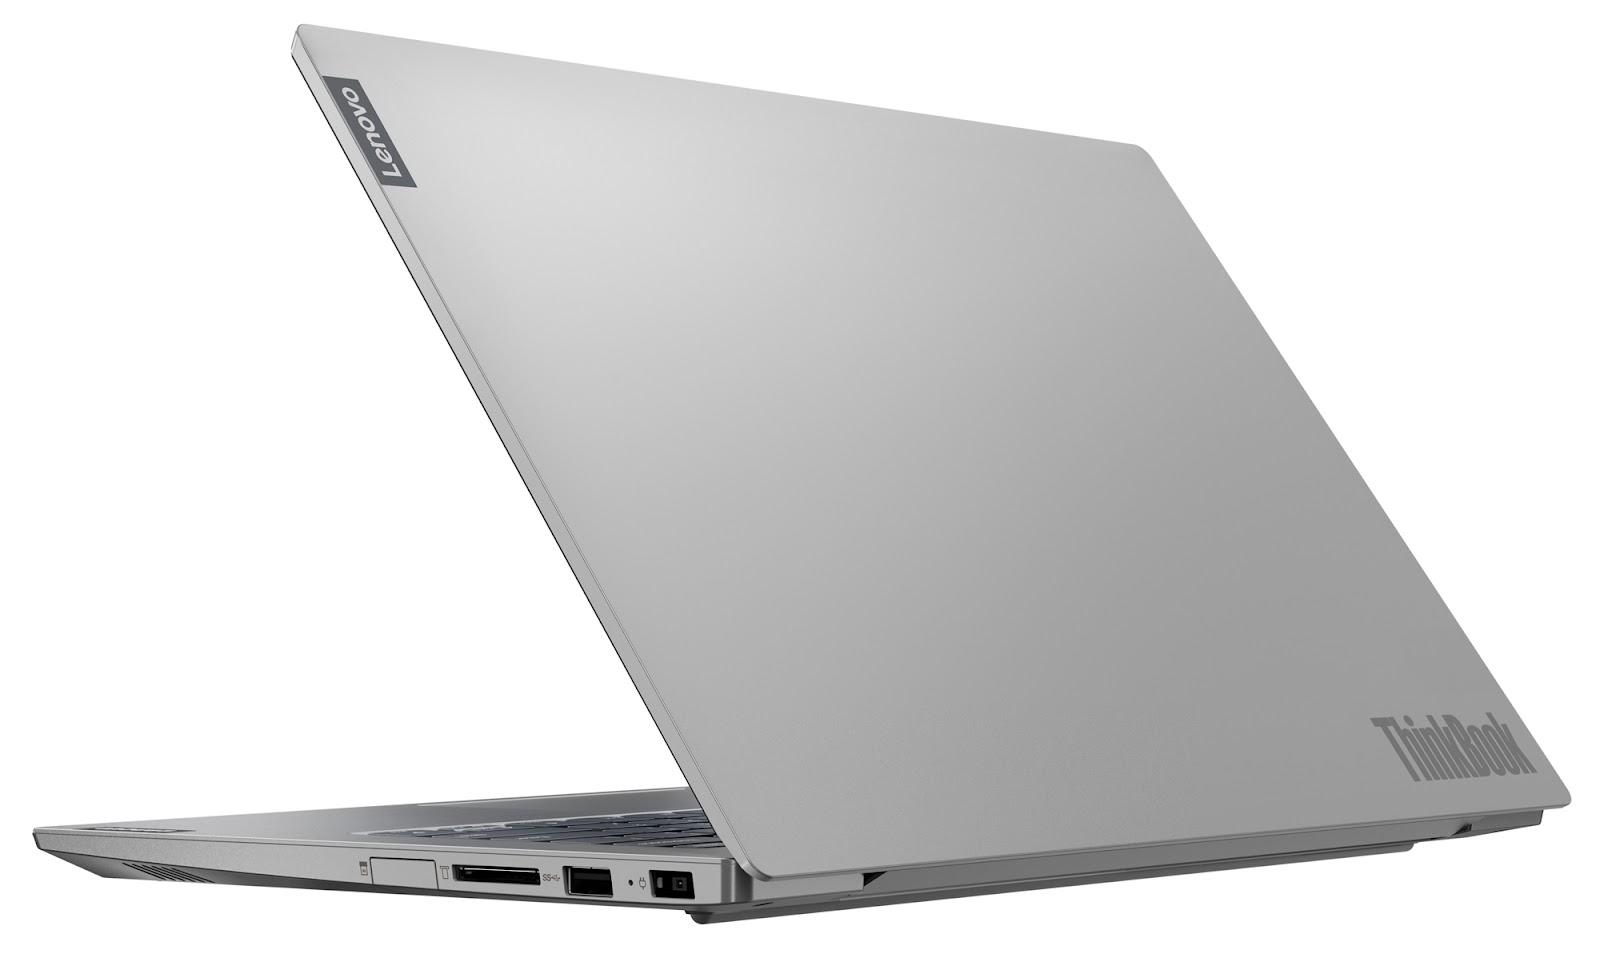 Фото 2. Ноутбук Lenovo ThinkBook 14 IIL (20SL00F2RU)